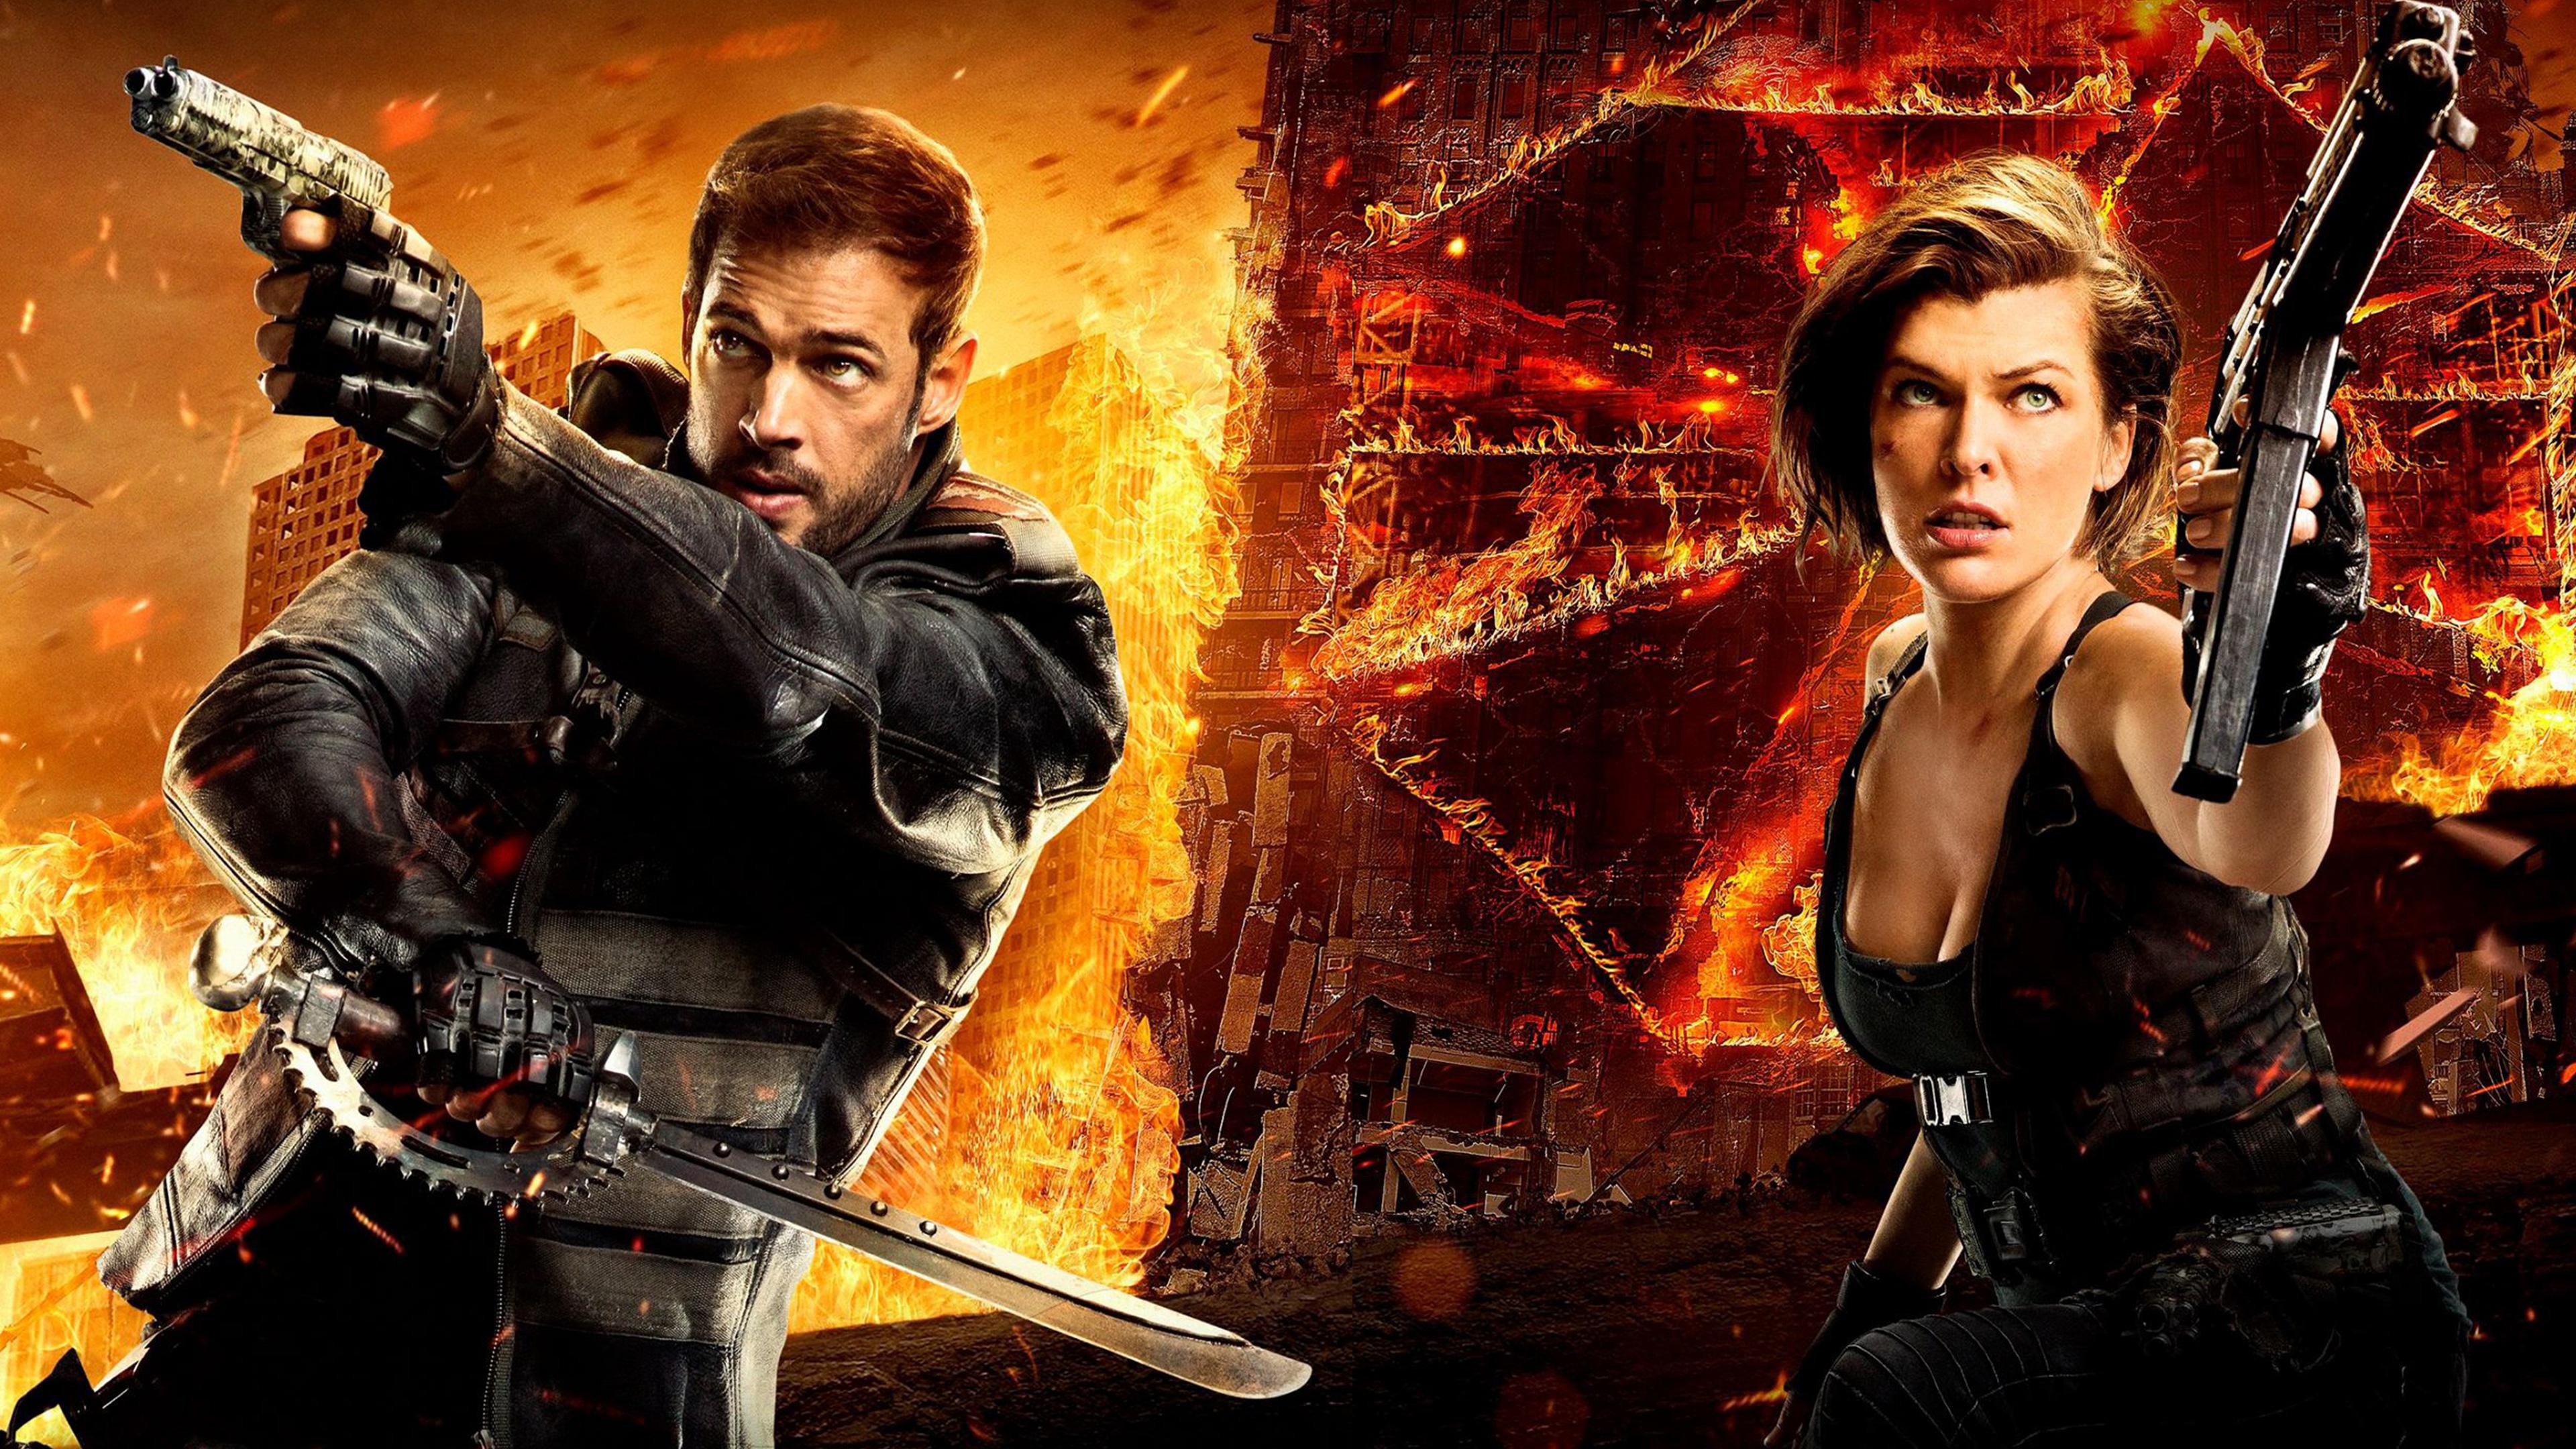 Wallpaper Milla Jovovich Ali Larter Ruby Rose Resident: Resident Evil The Final Chapter New Poster, HD Movies, 4k